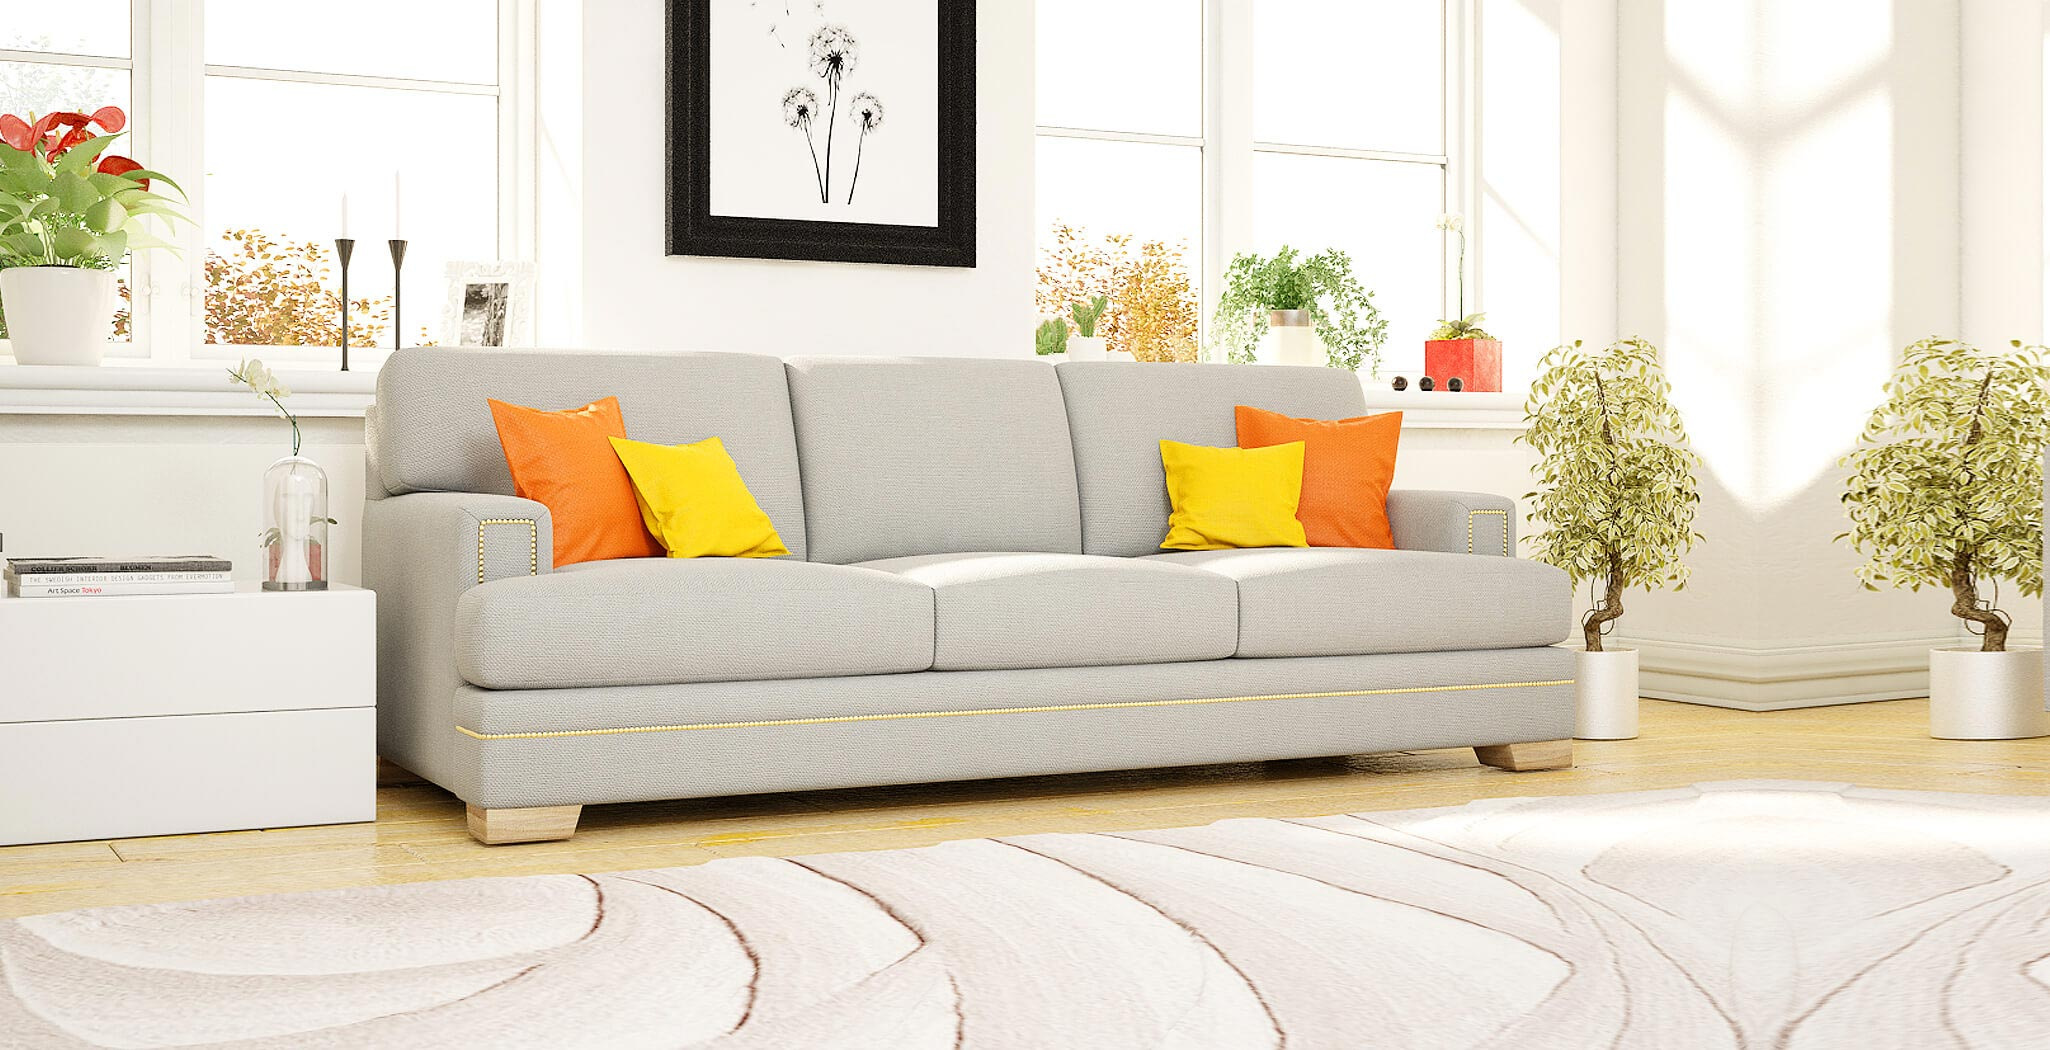 barcelona sofa furniture gallery 2